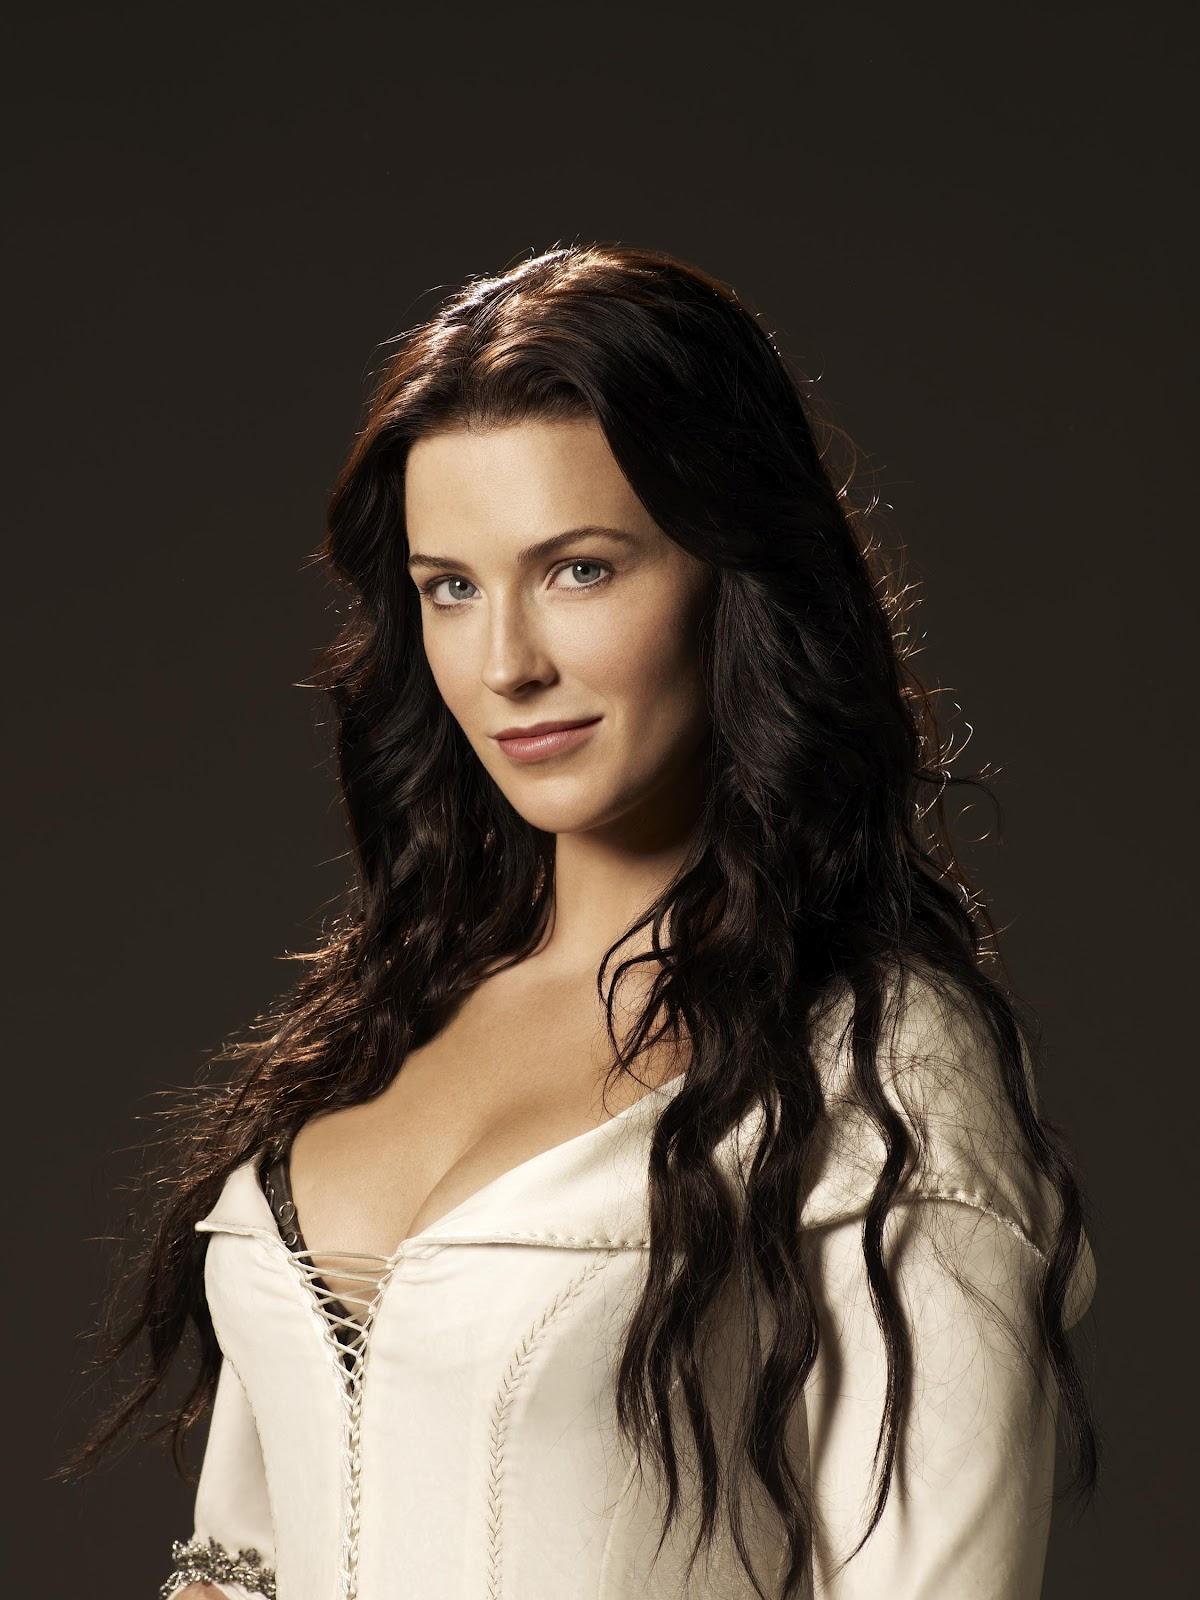 Celebrities Movies And Games Bridget Regan As Kahlan